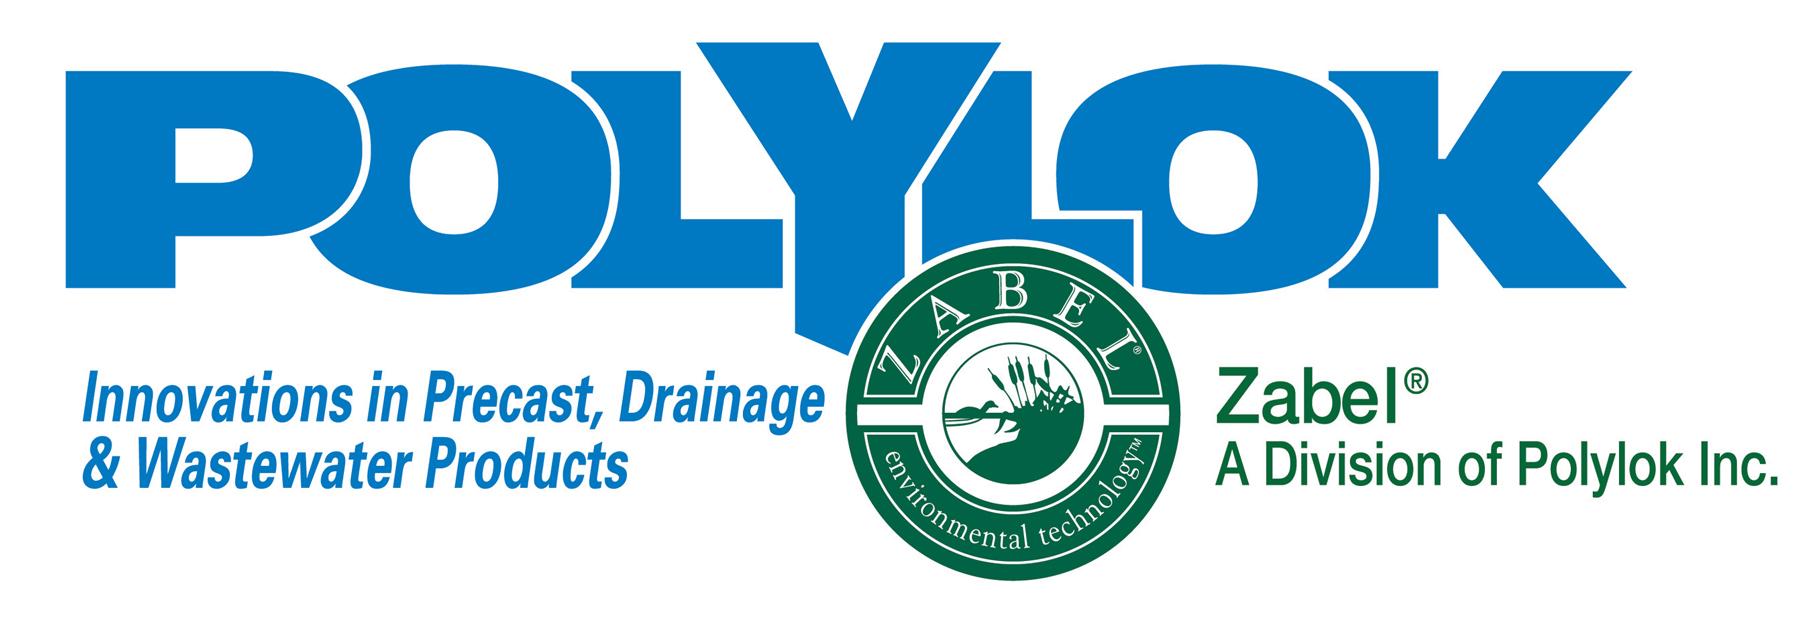 Polylok Logo